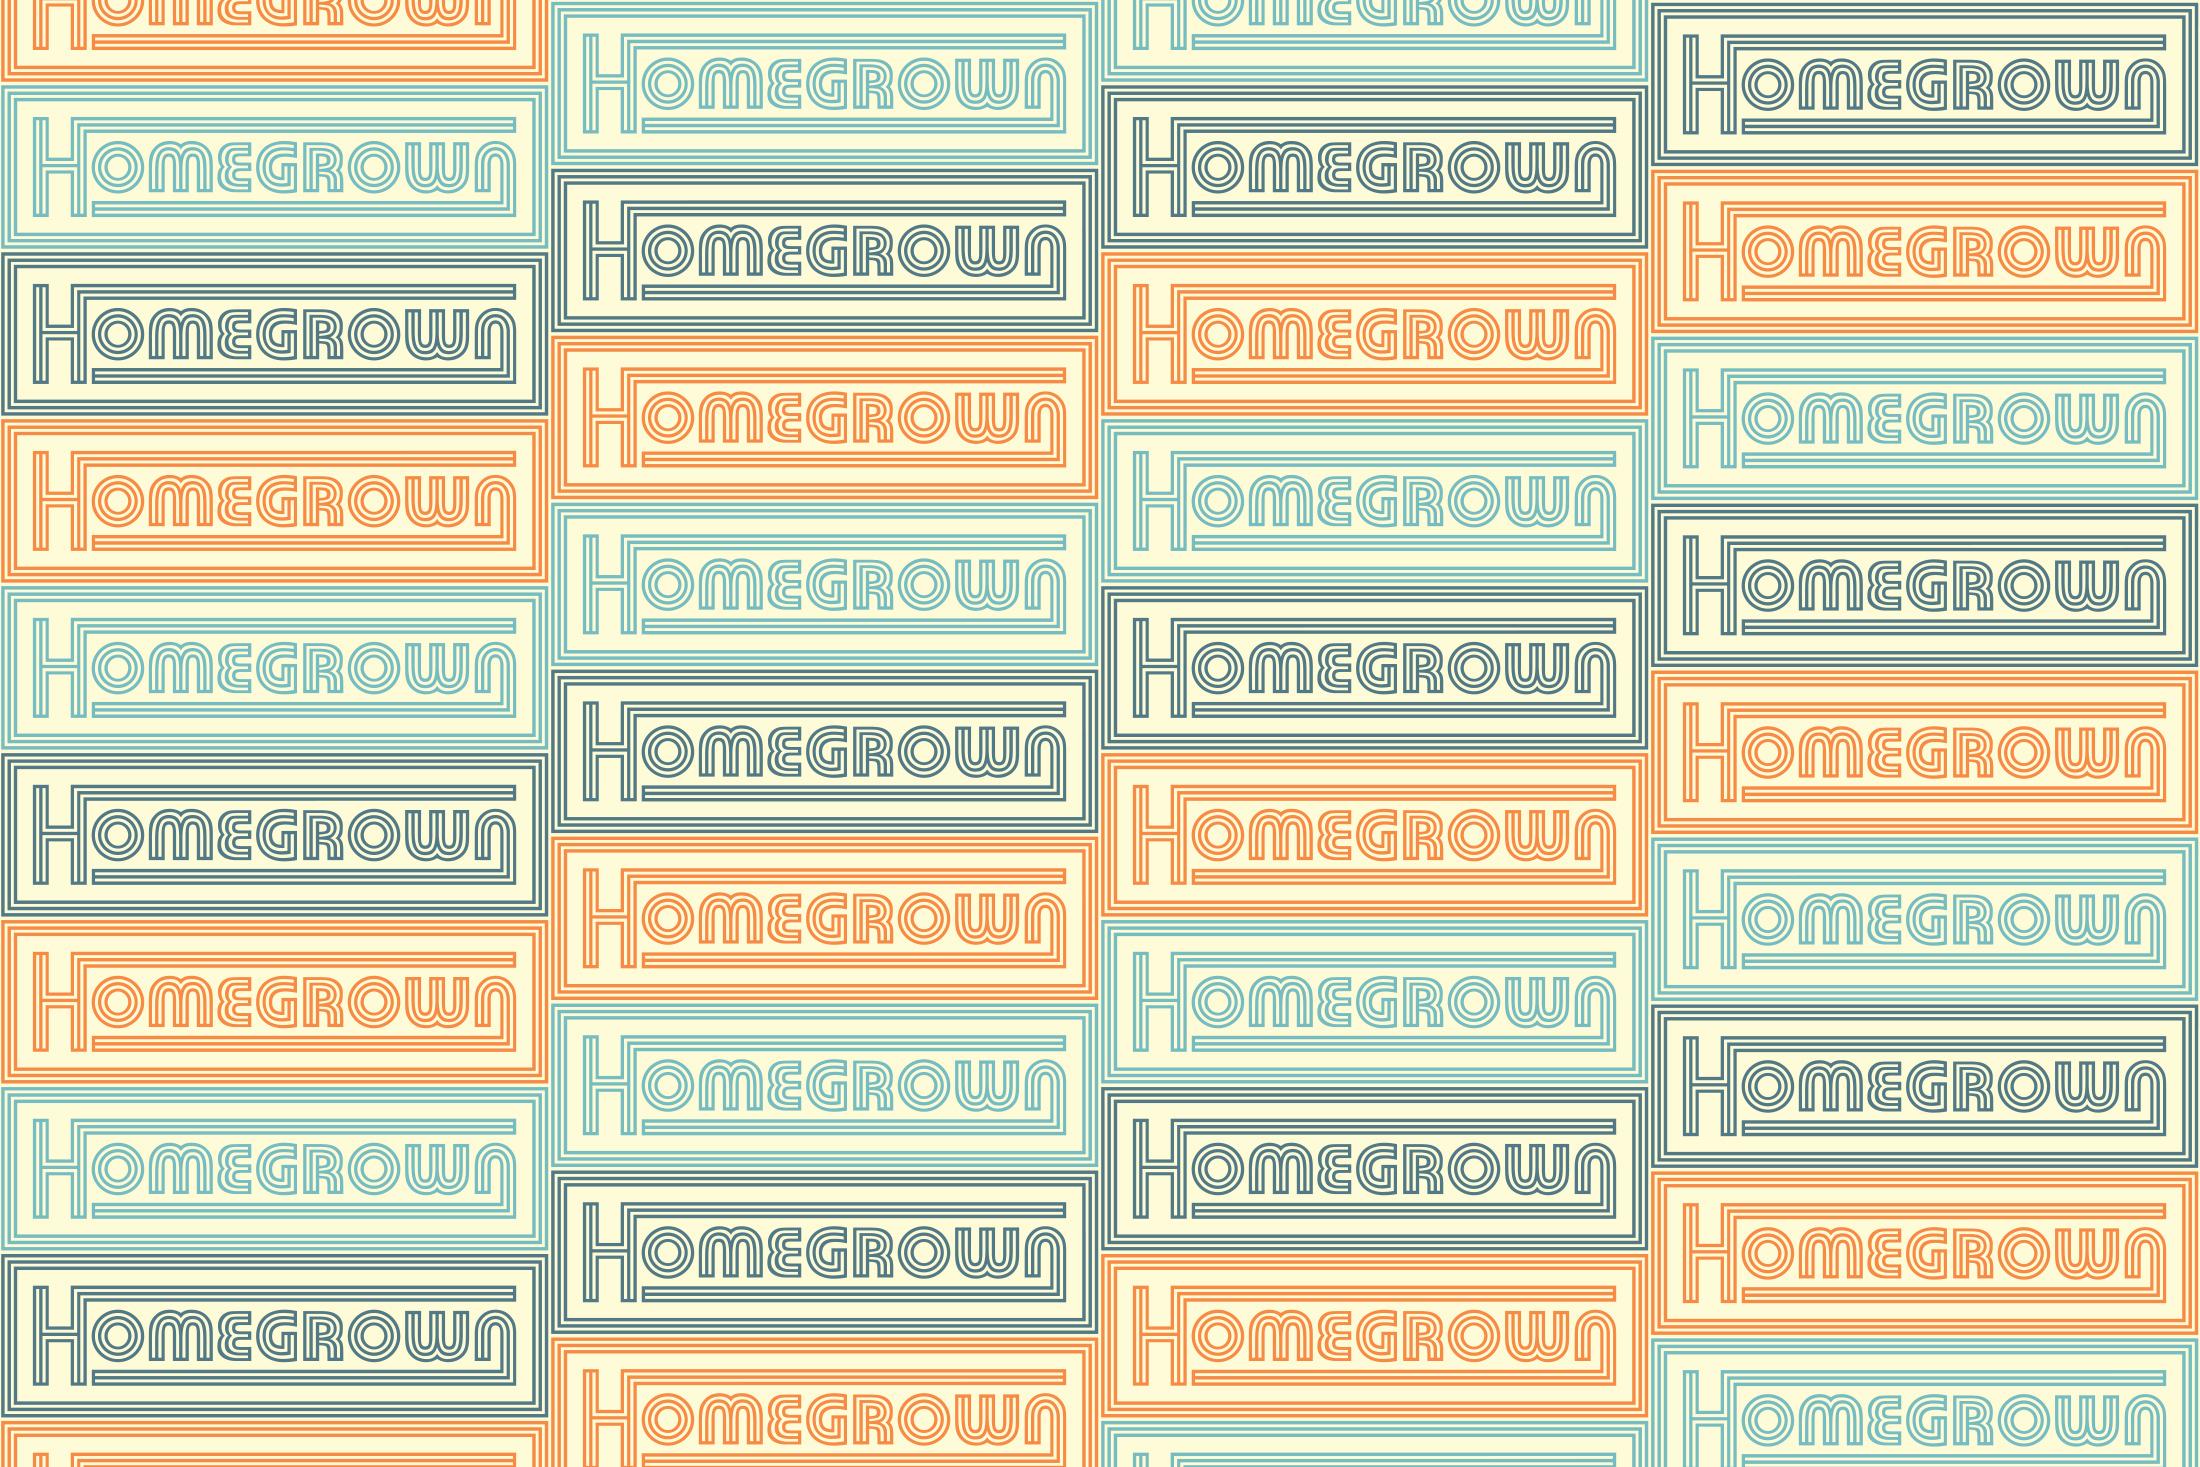 HomegrownDist.jpg